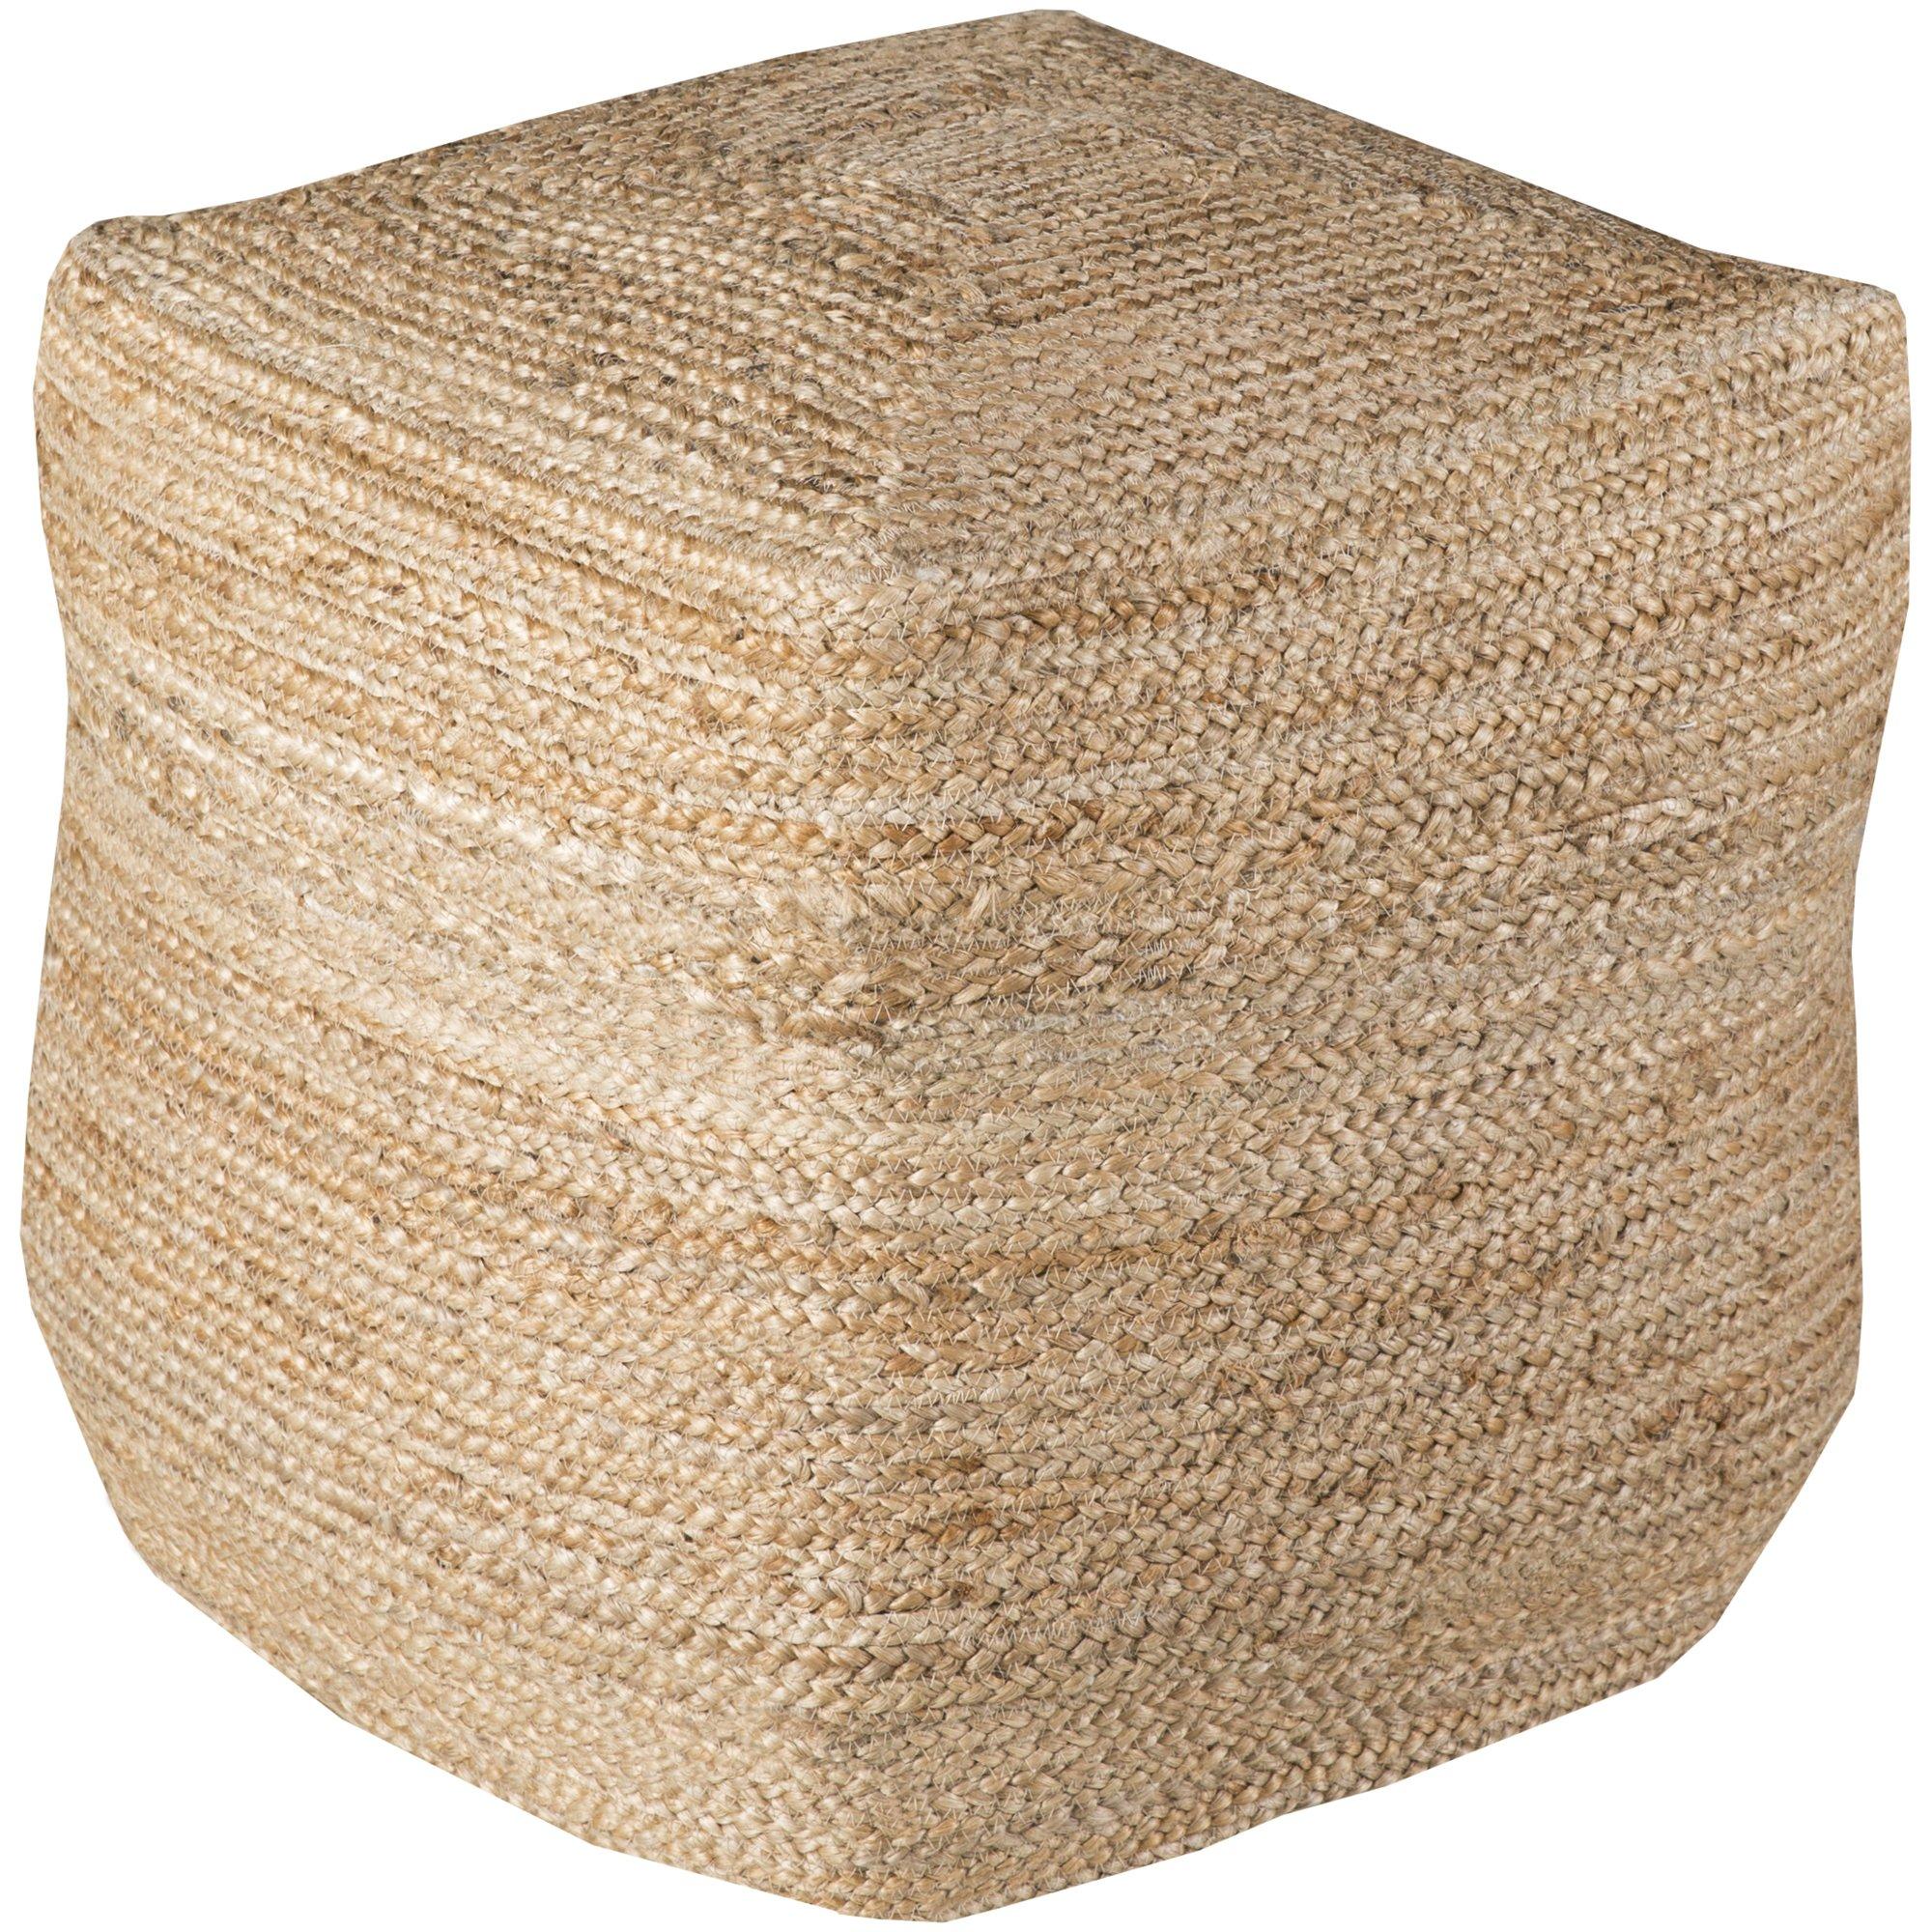 Surya POUF-101 Hand Made 100% Jute Desert Sand 18'' x 18'' x 18'' Pouf